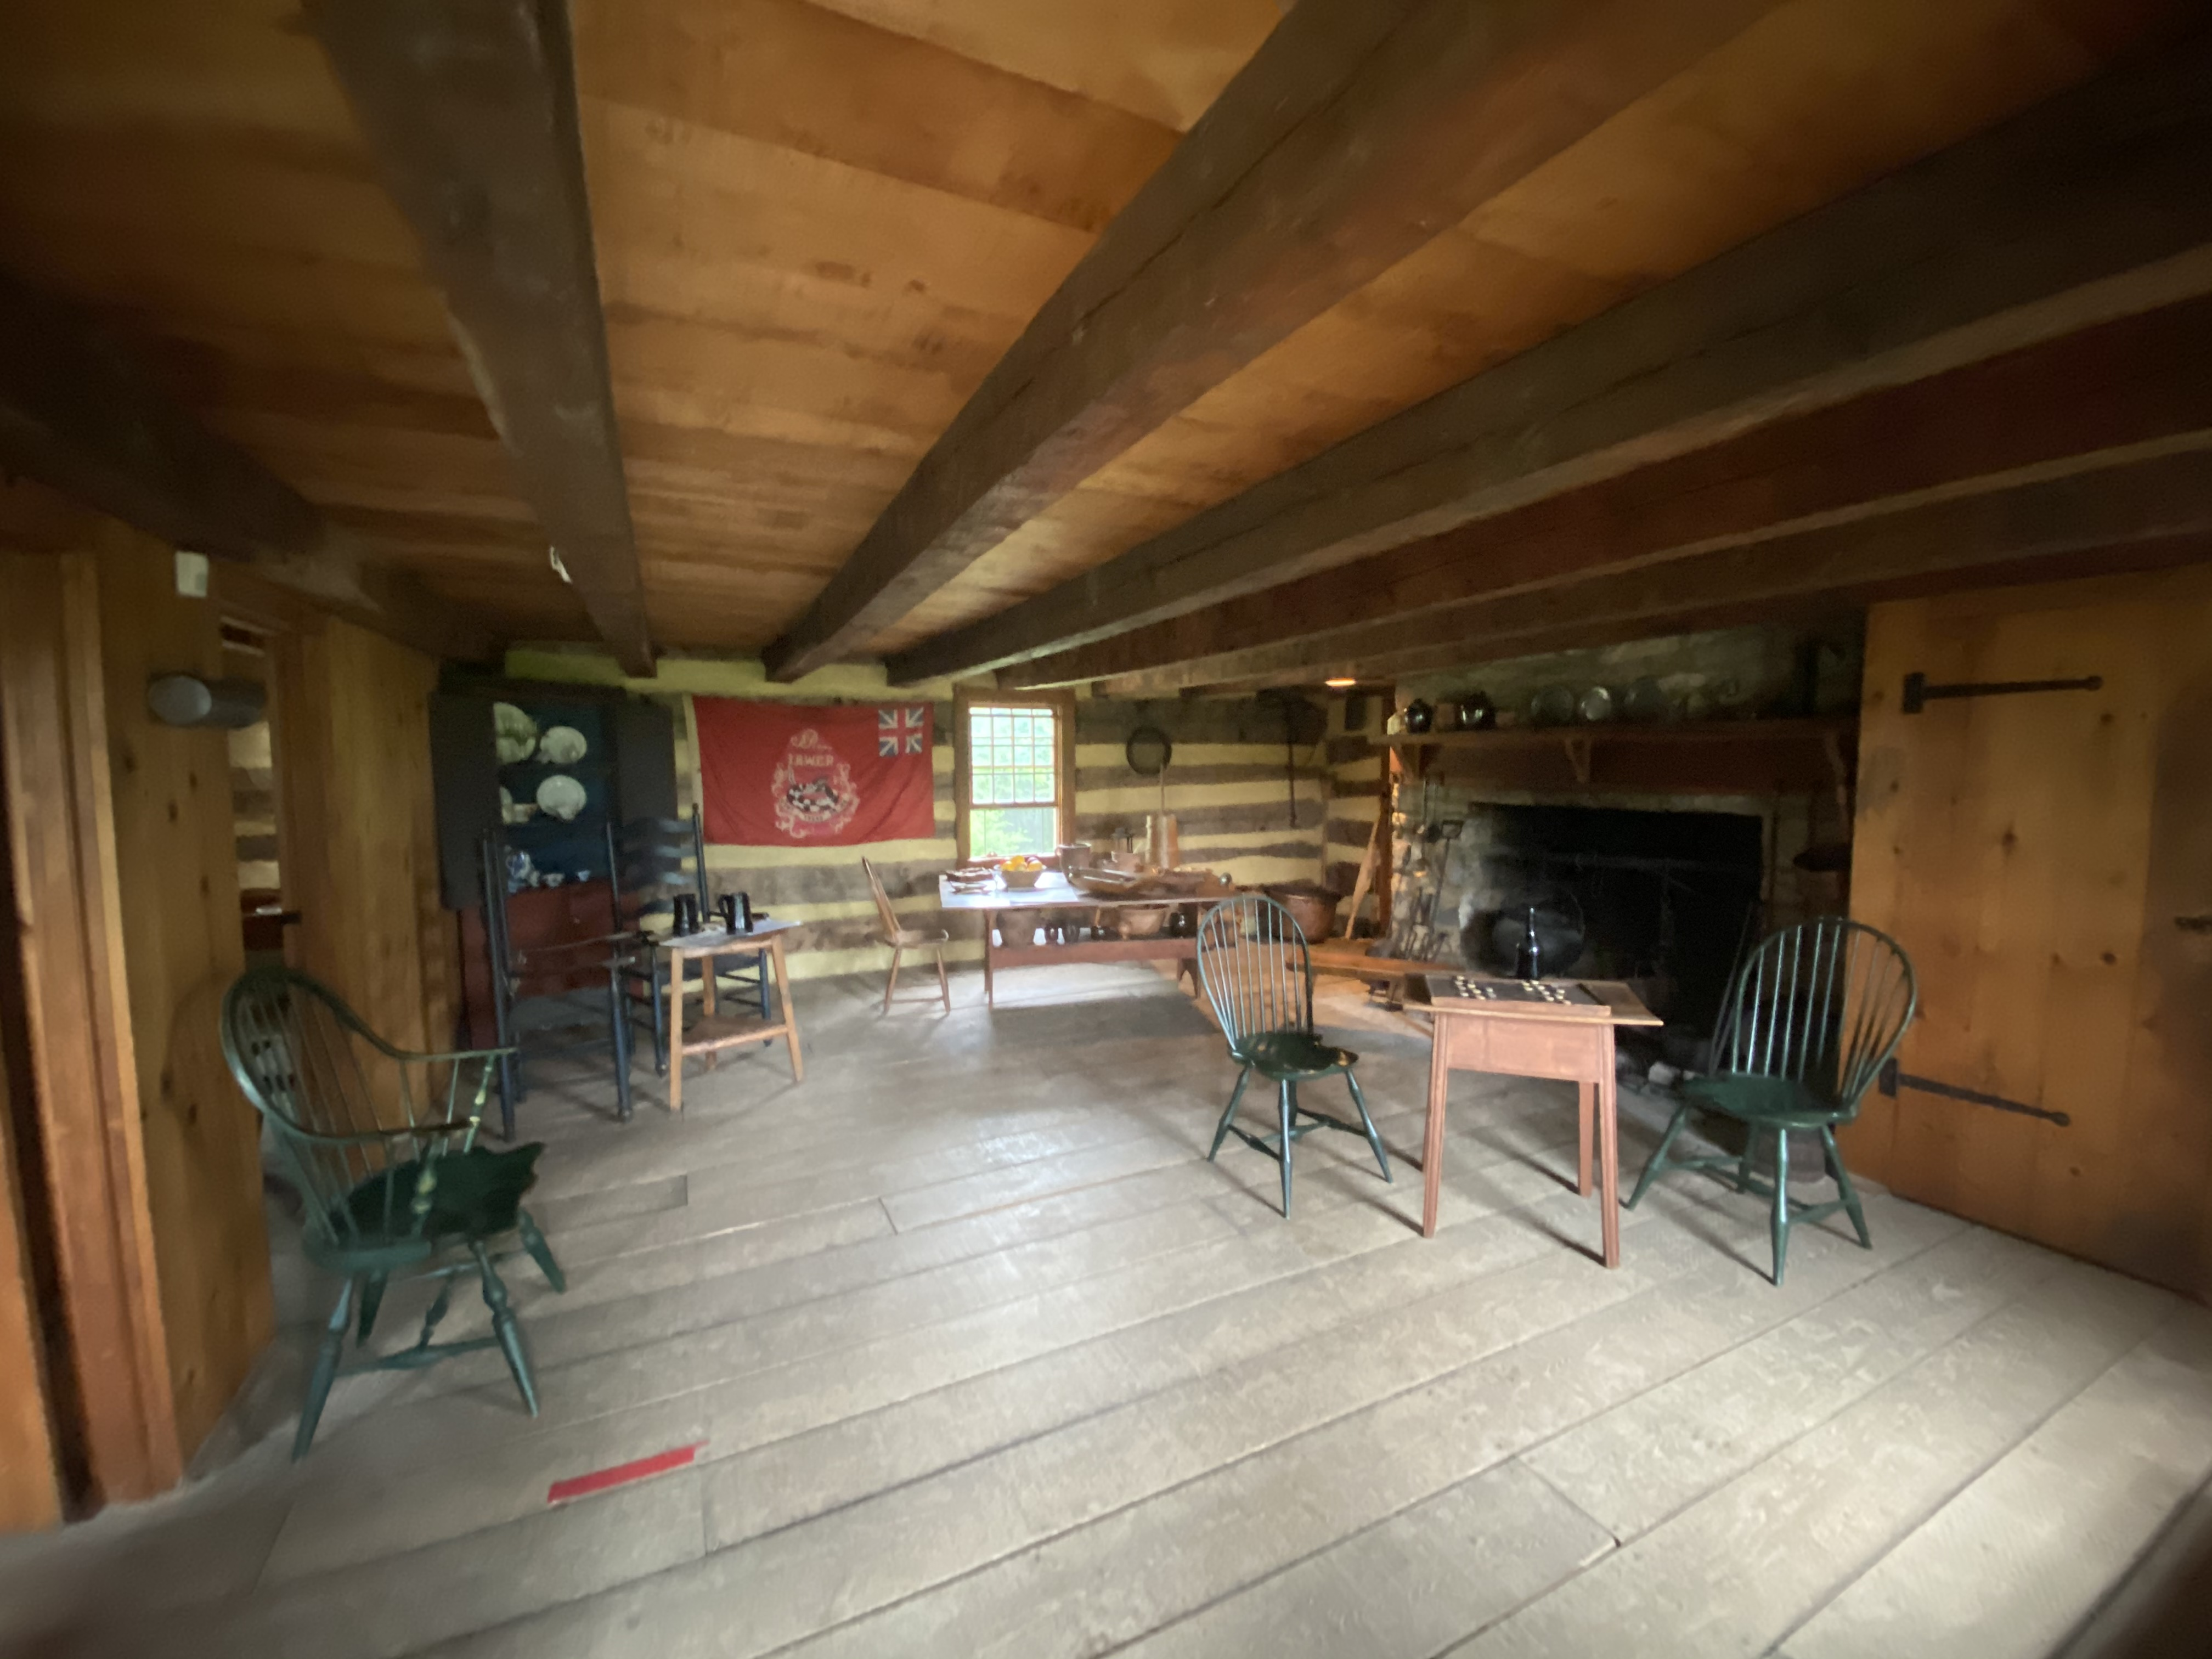 The main floor of the tavern